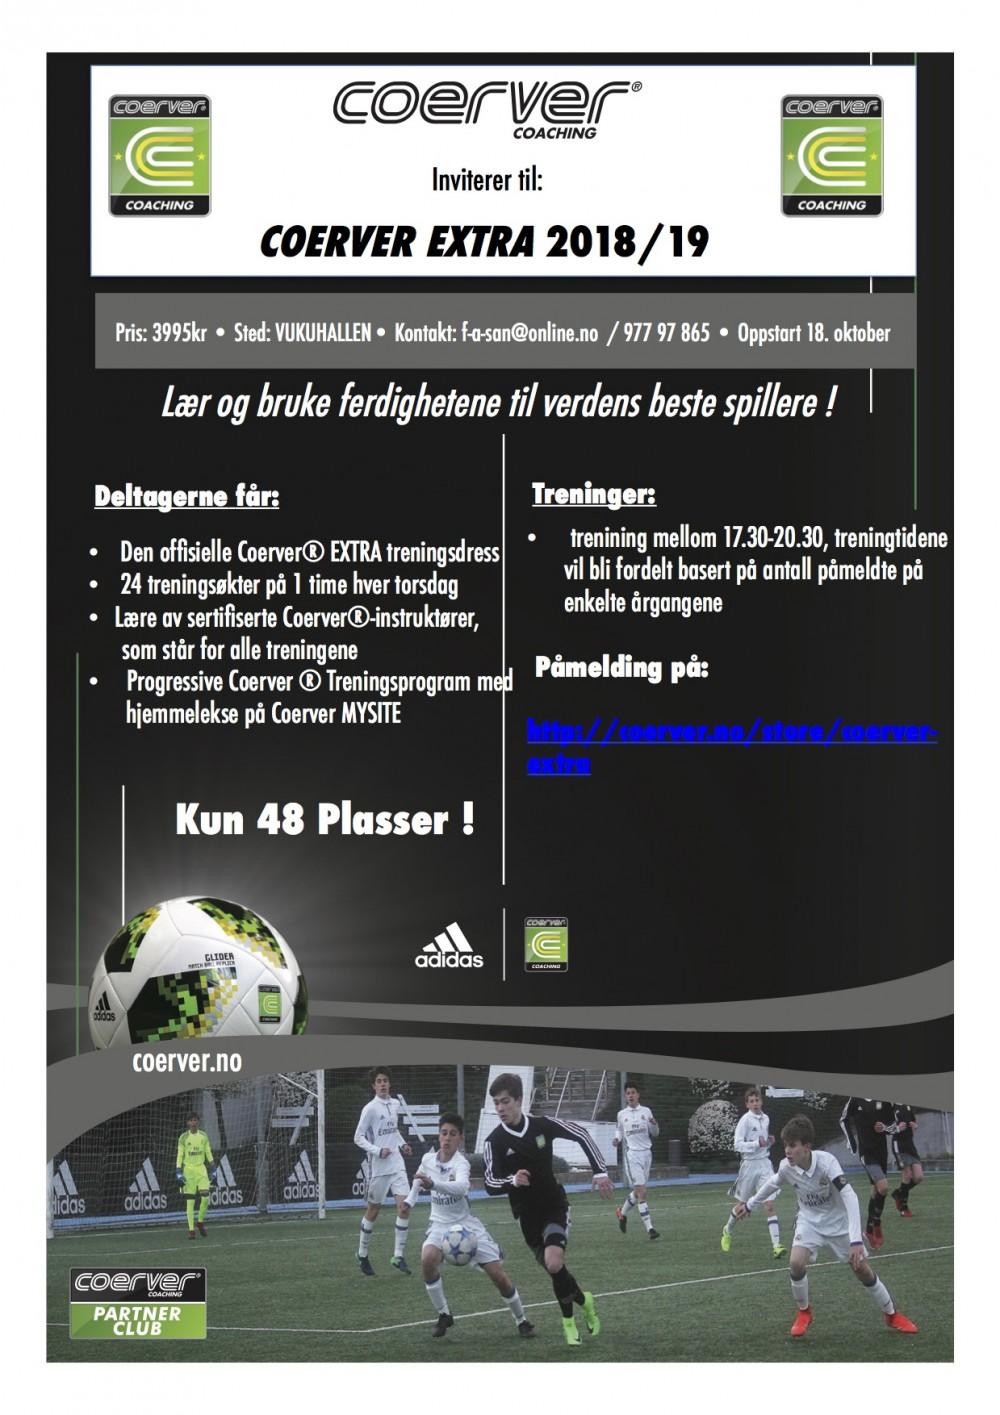 Coerver Extra på Vukuhallen 2018/19